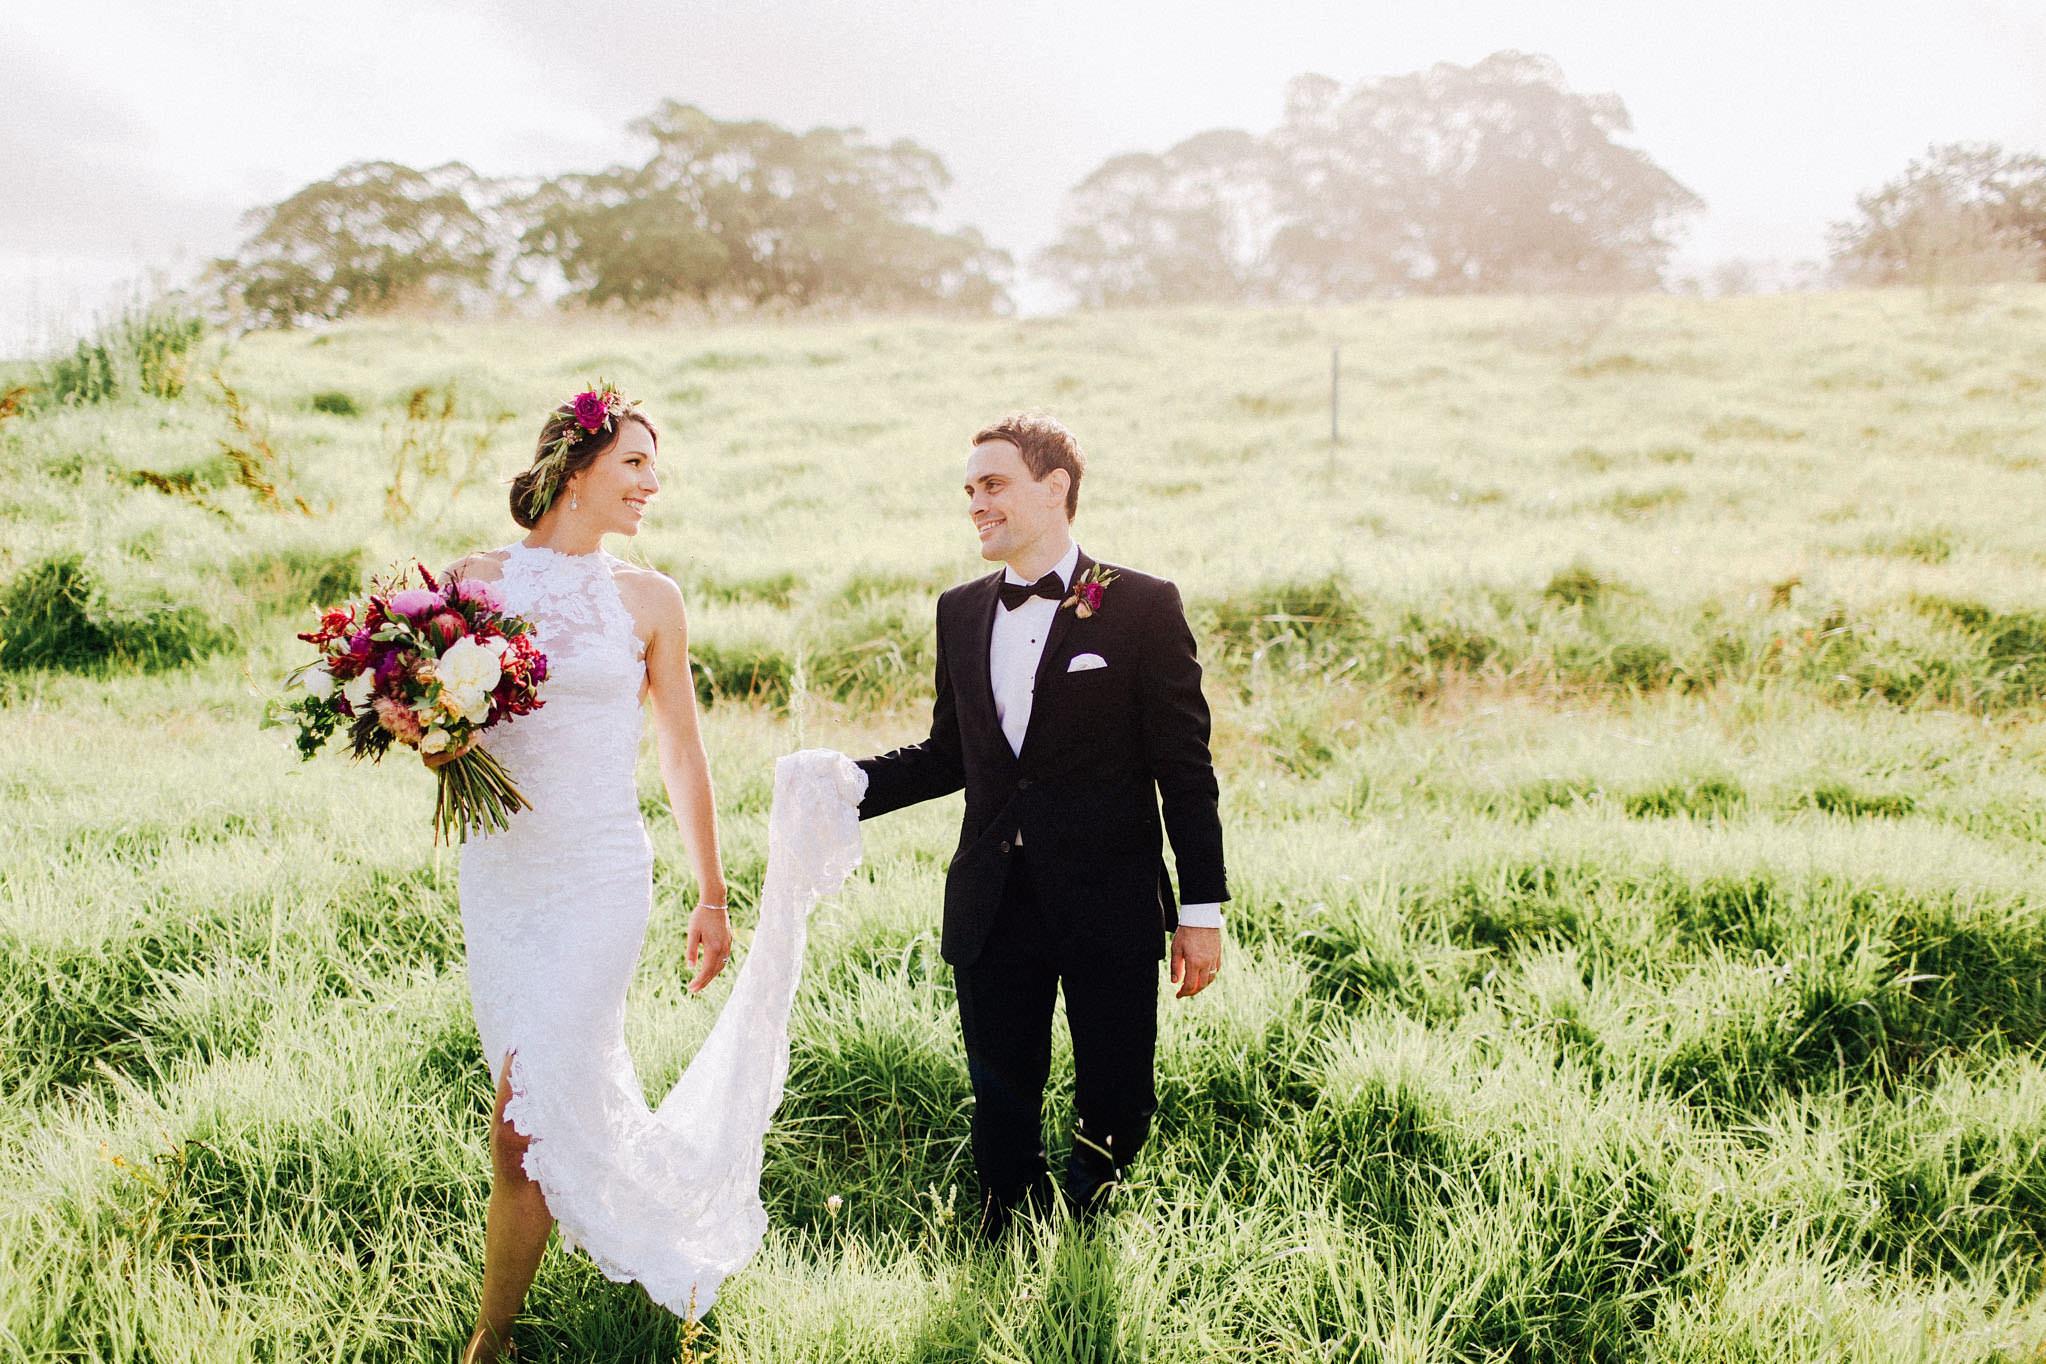 TocalHomestead_WeddingPhotography_LaurenAnnePhotography-1104.jpg